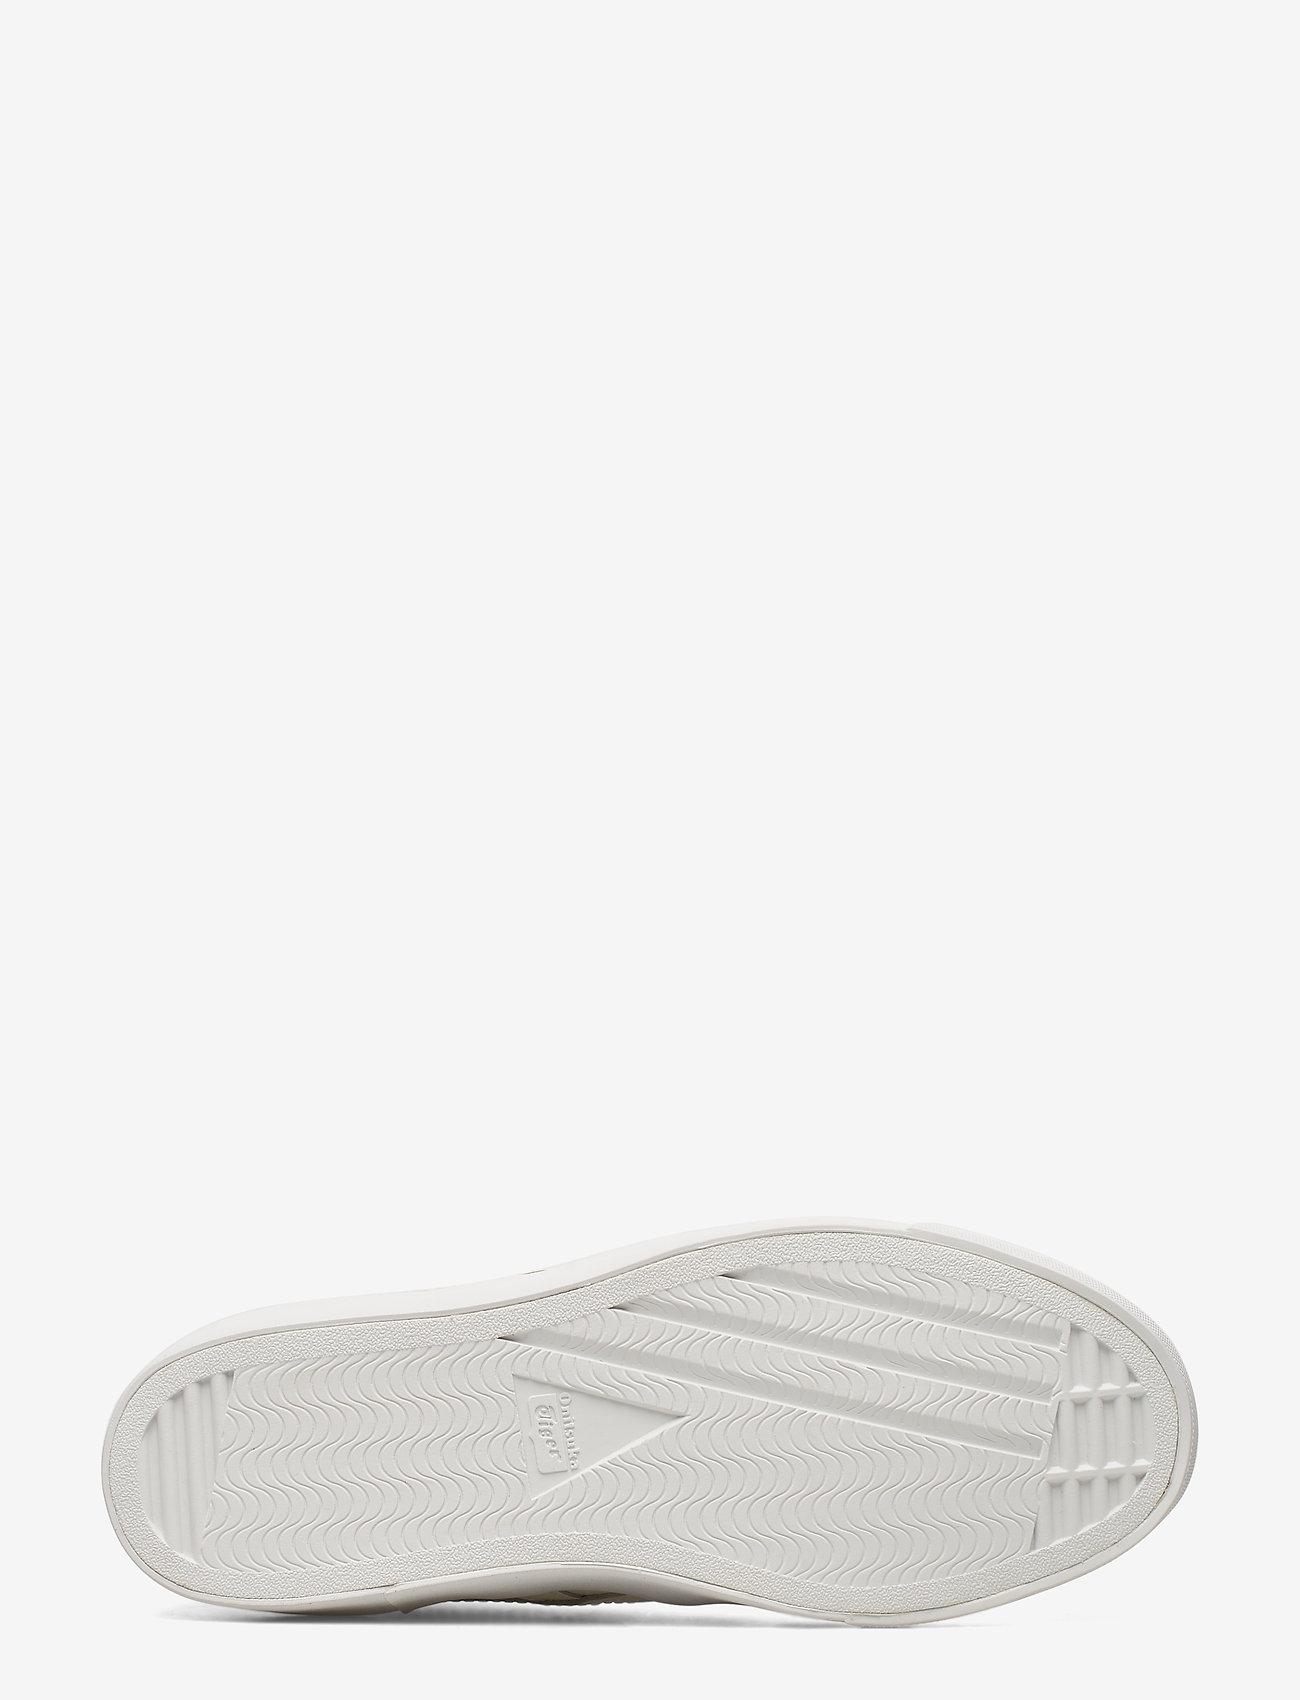 Fabre Bl-s 2.0 (White/white) - Onitsuka Tiger